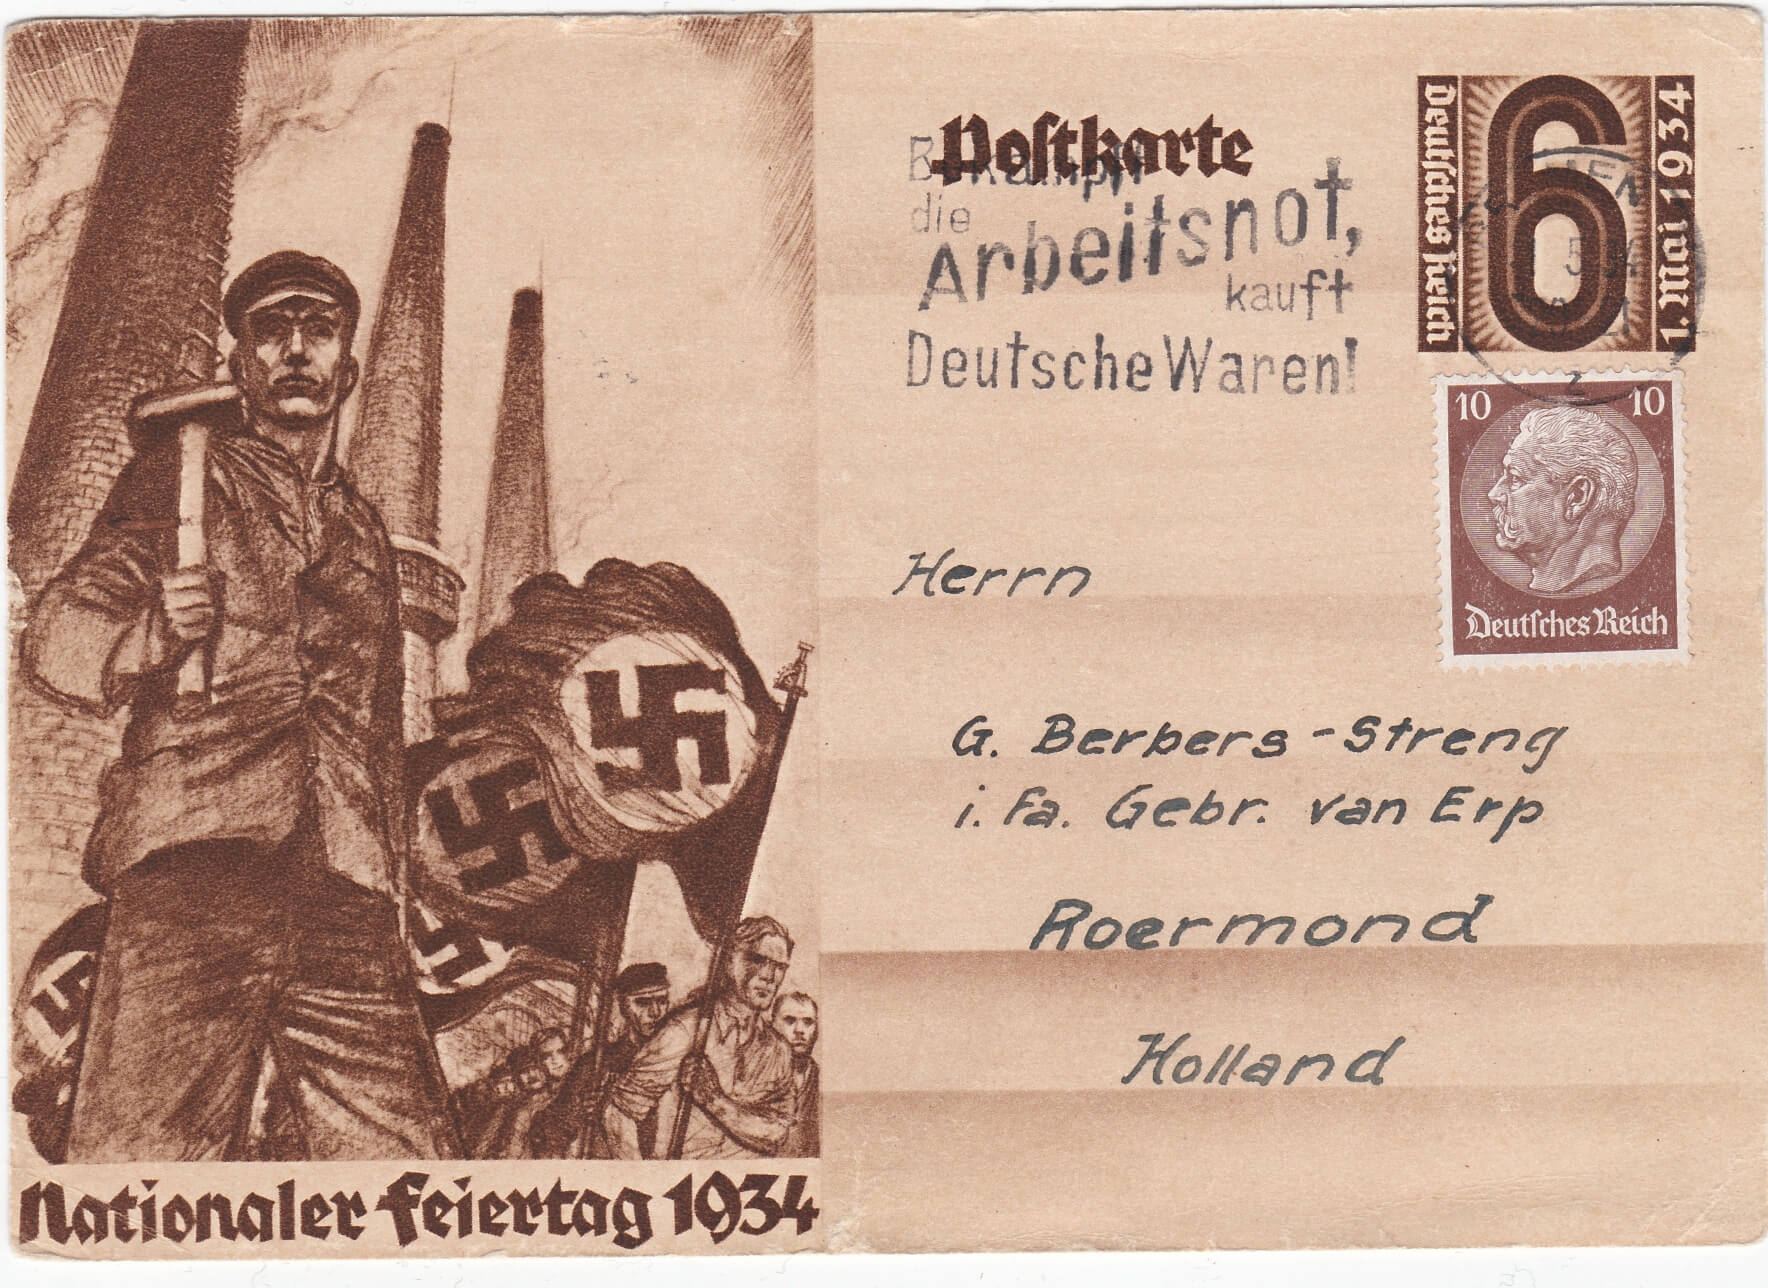 Nationaler Feiertag 1934 postkaart